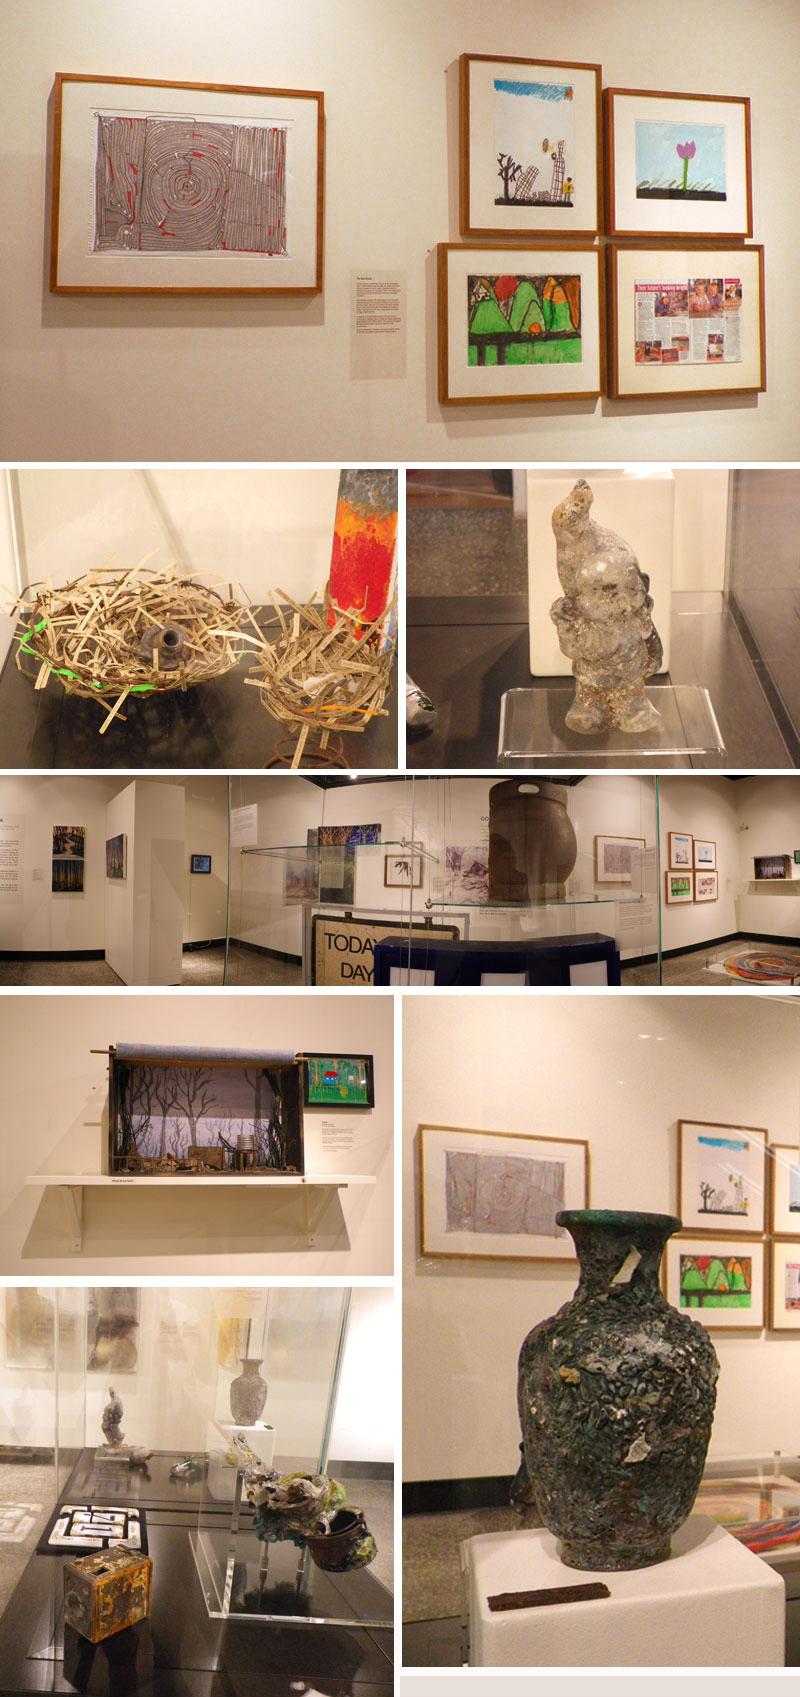 Black Saturday exhibition at Yarra Ranges Regional Museum